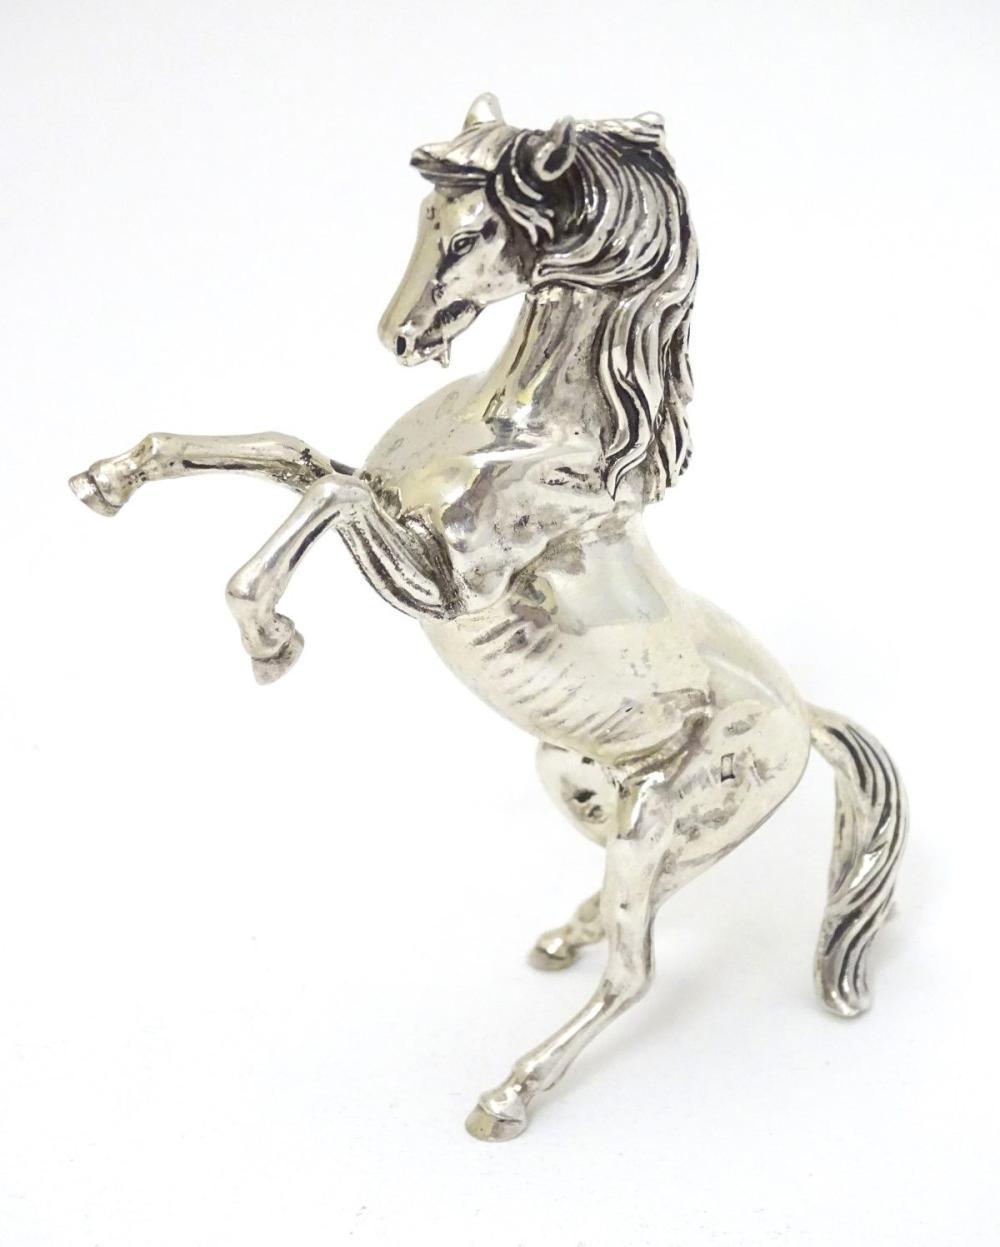 An Egyptian silver model of a horse 4'' long